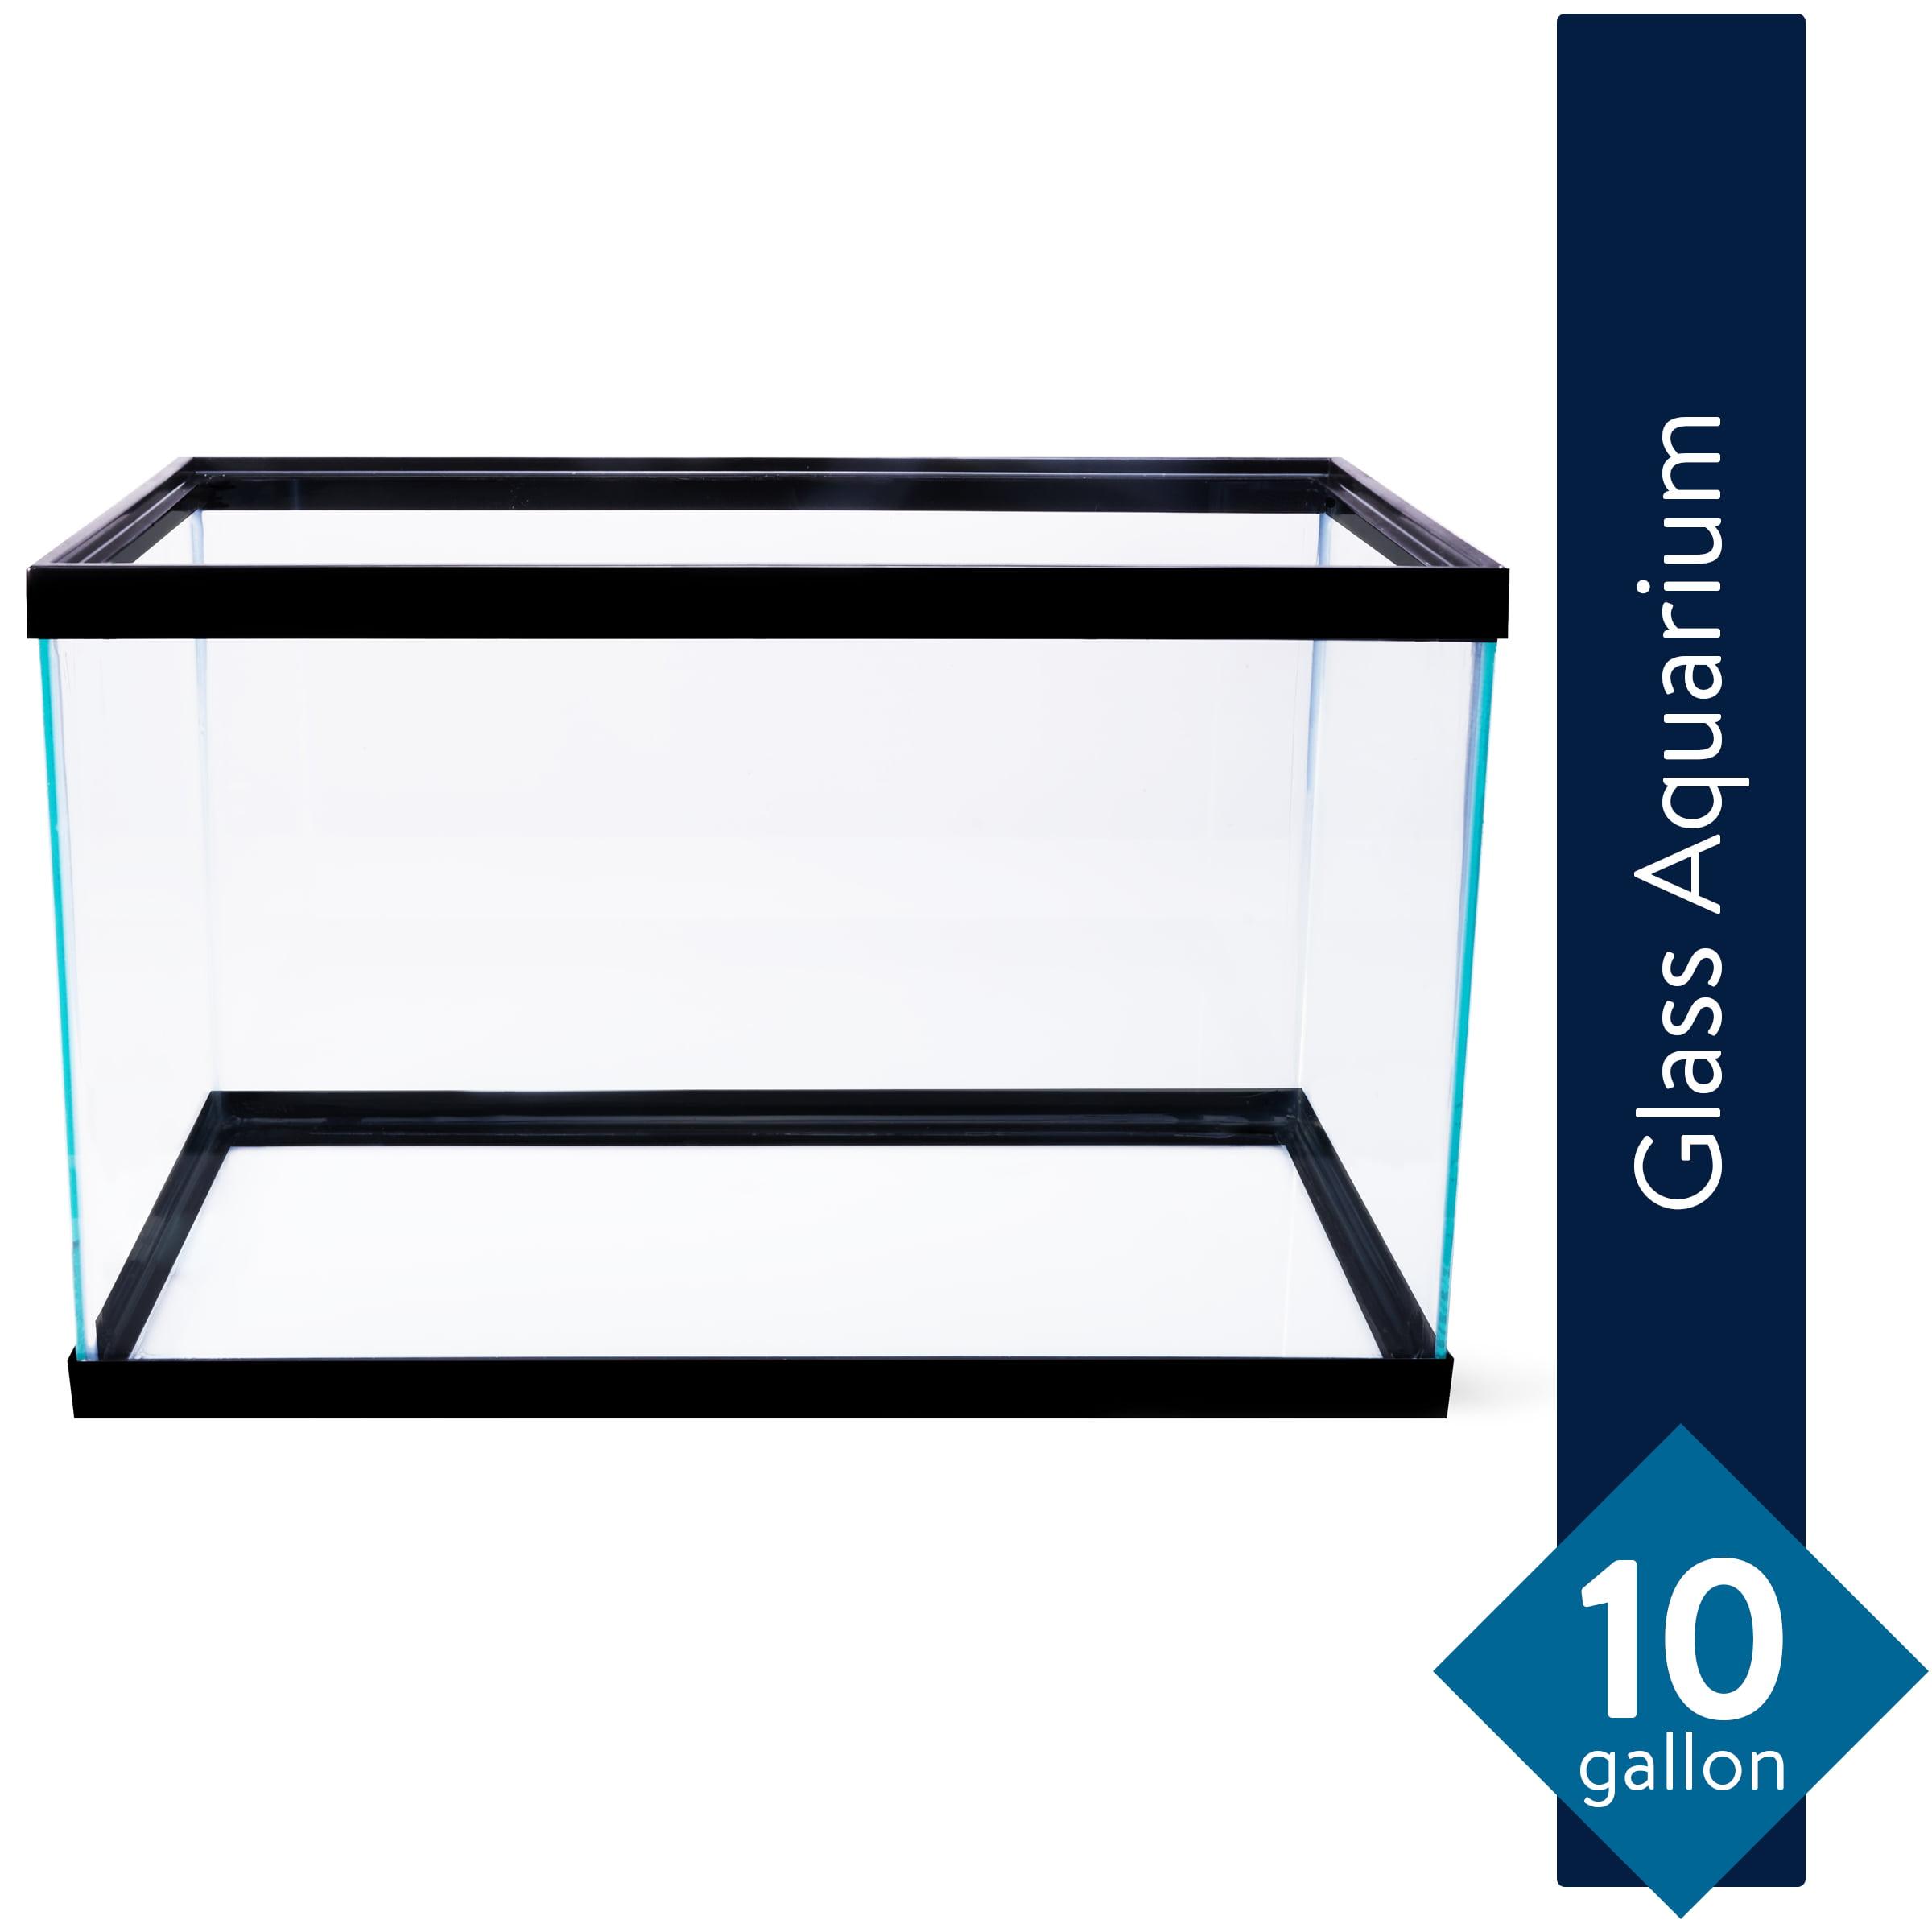 Aquaculture Aquarium 10 Gallon